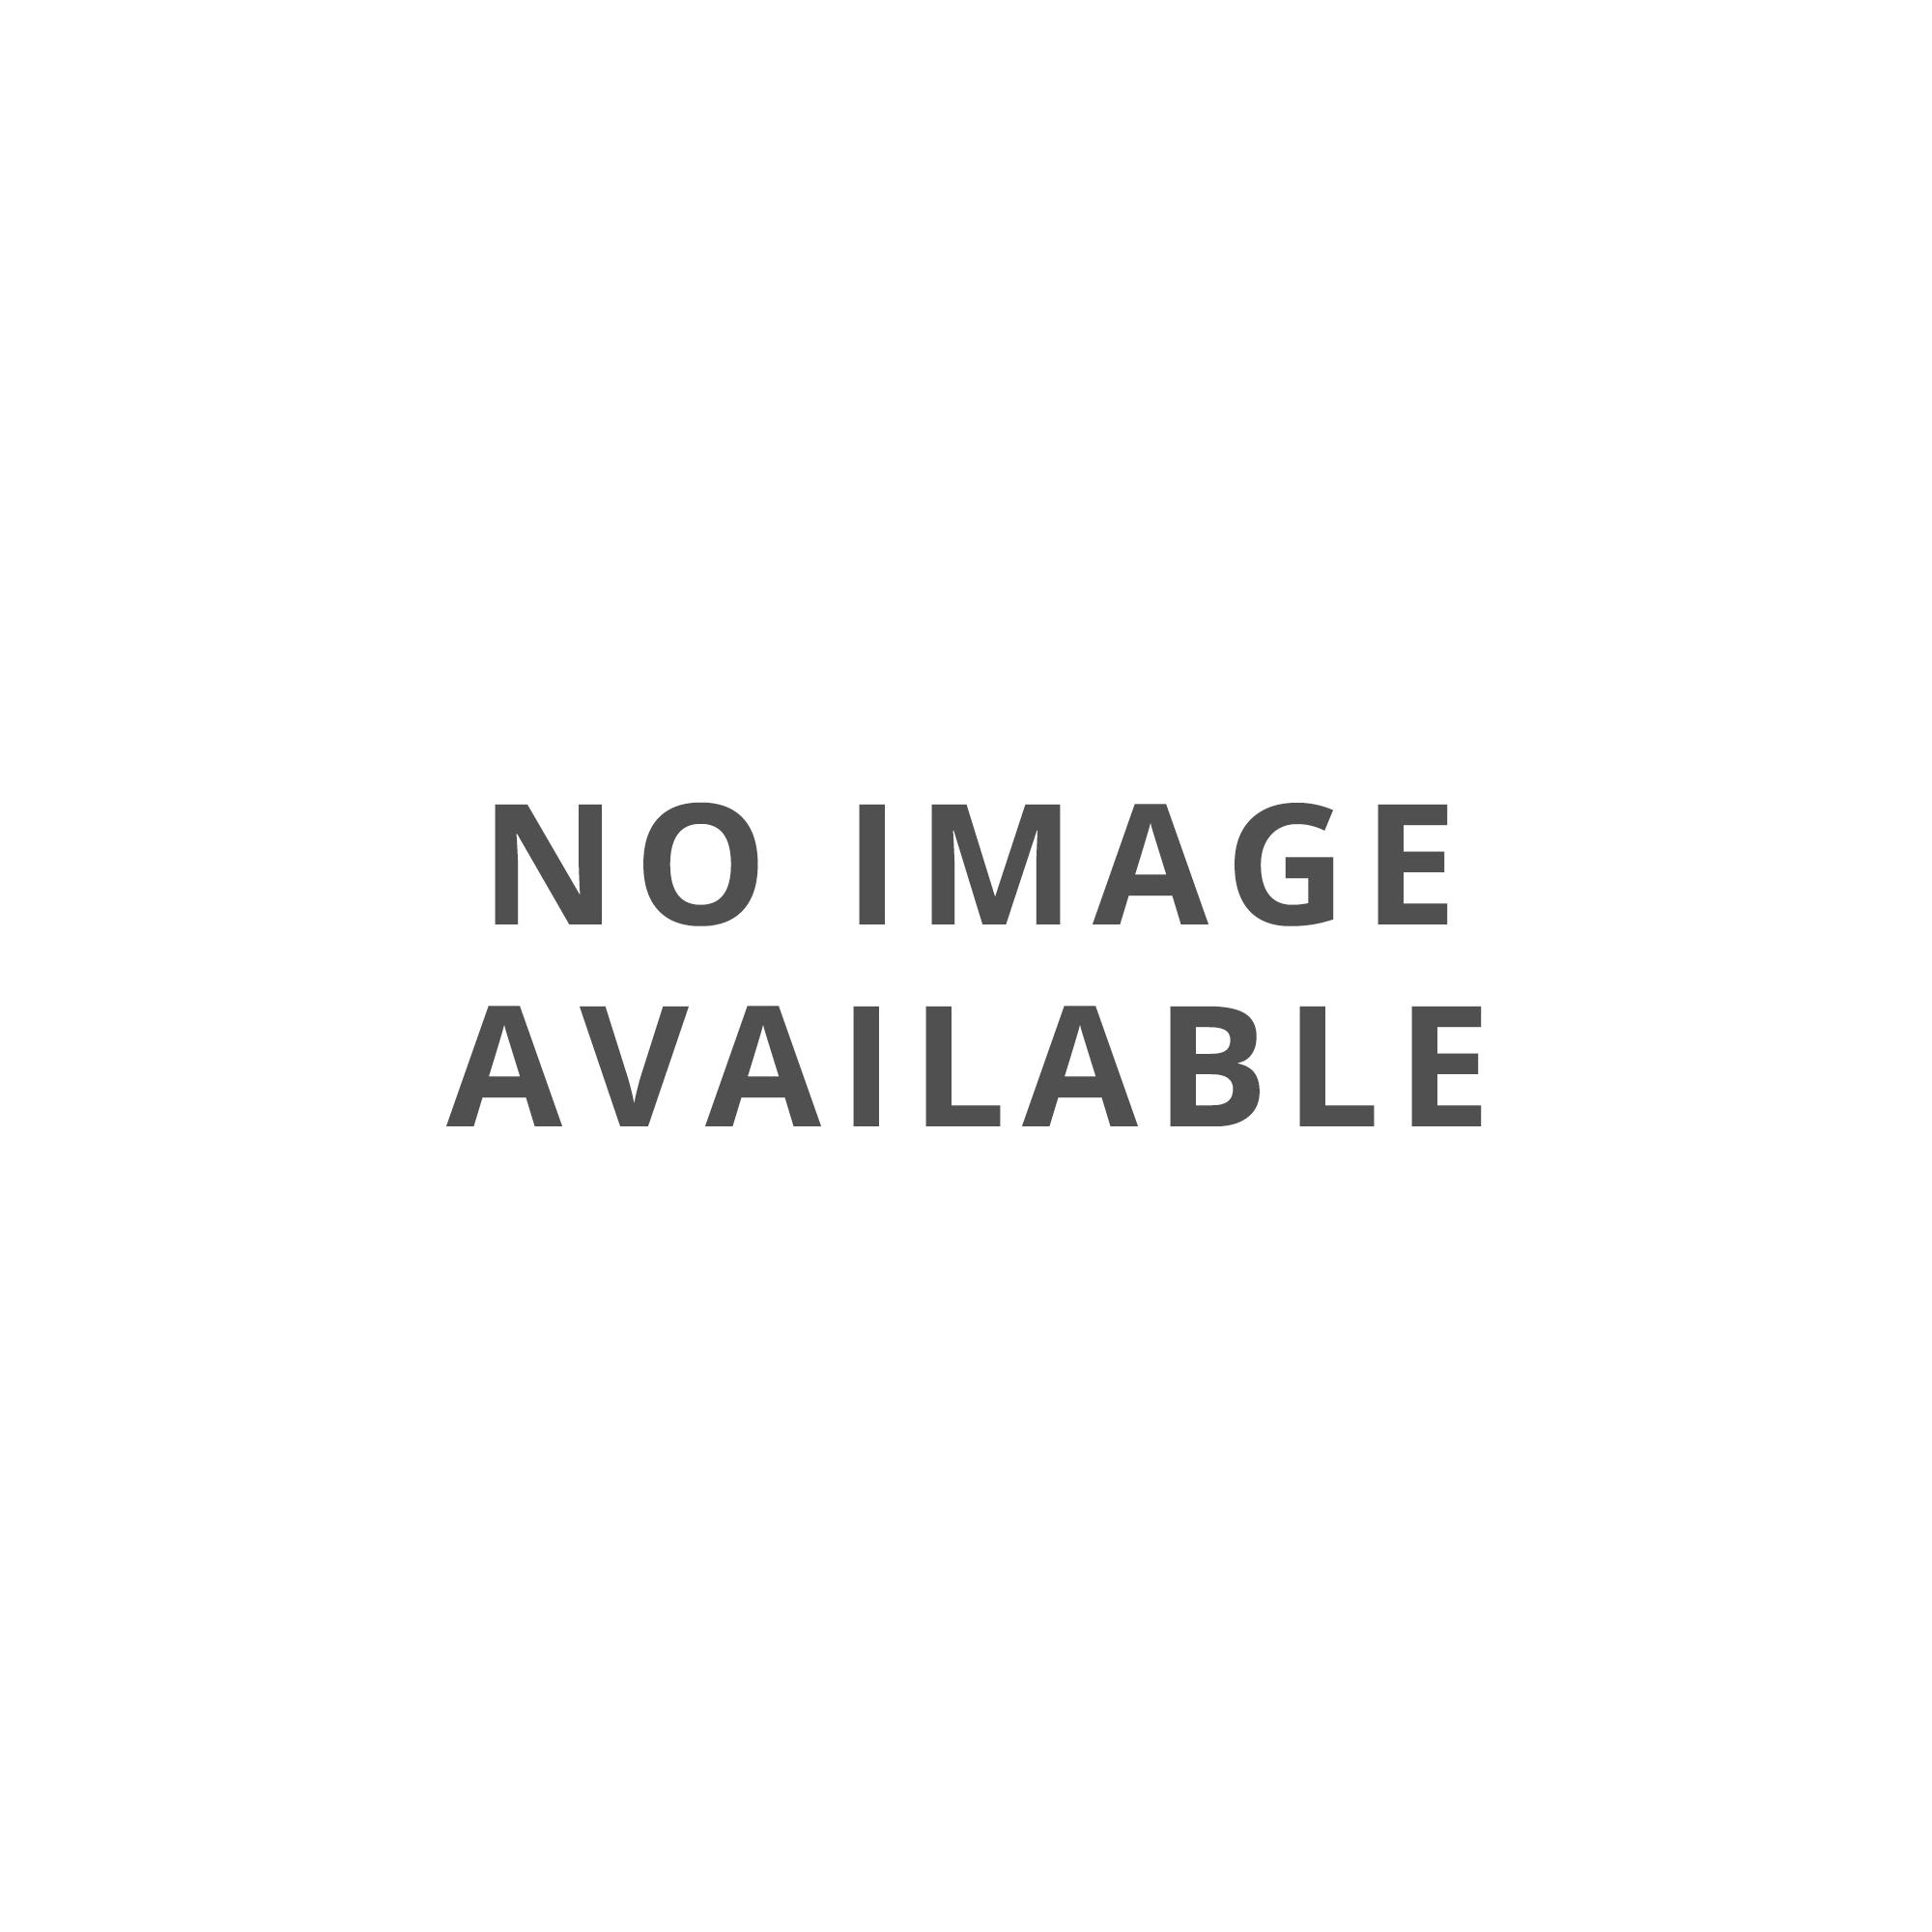 rangemaster aquaclassic 2 chrome kitchen sink mixer tap white handles - White Kitchen Sink Taps